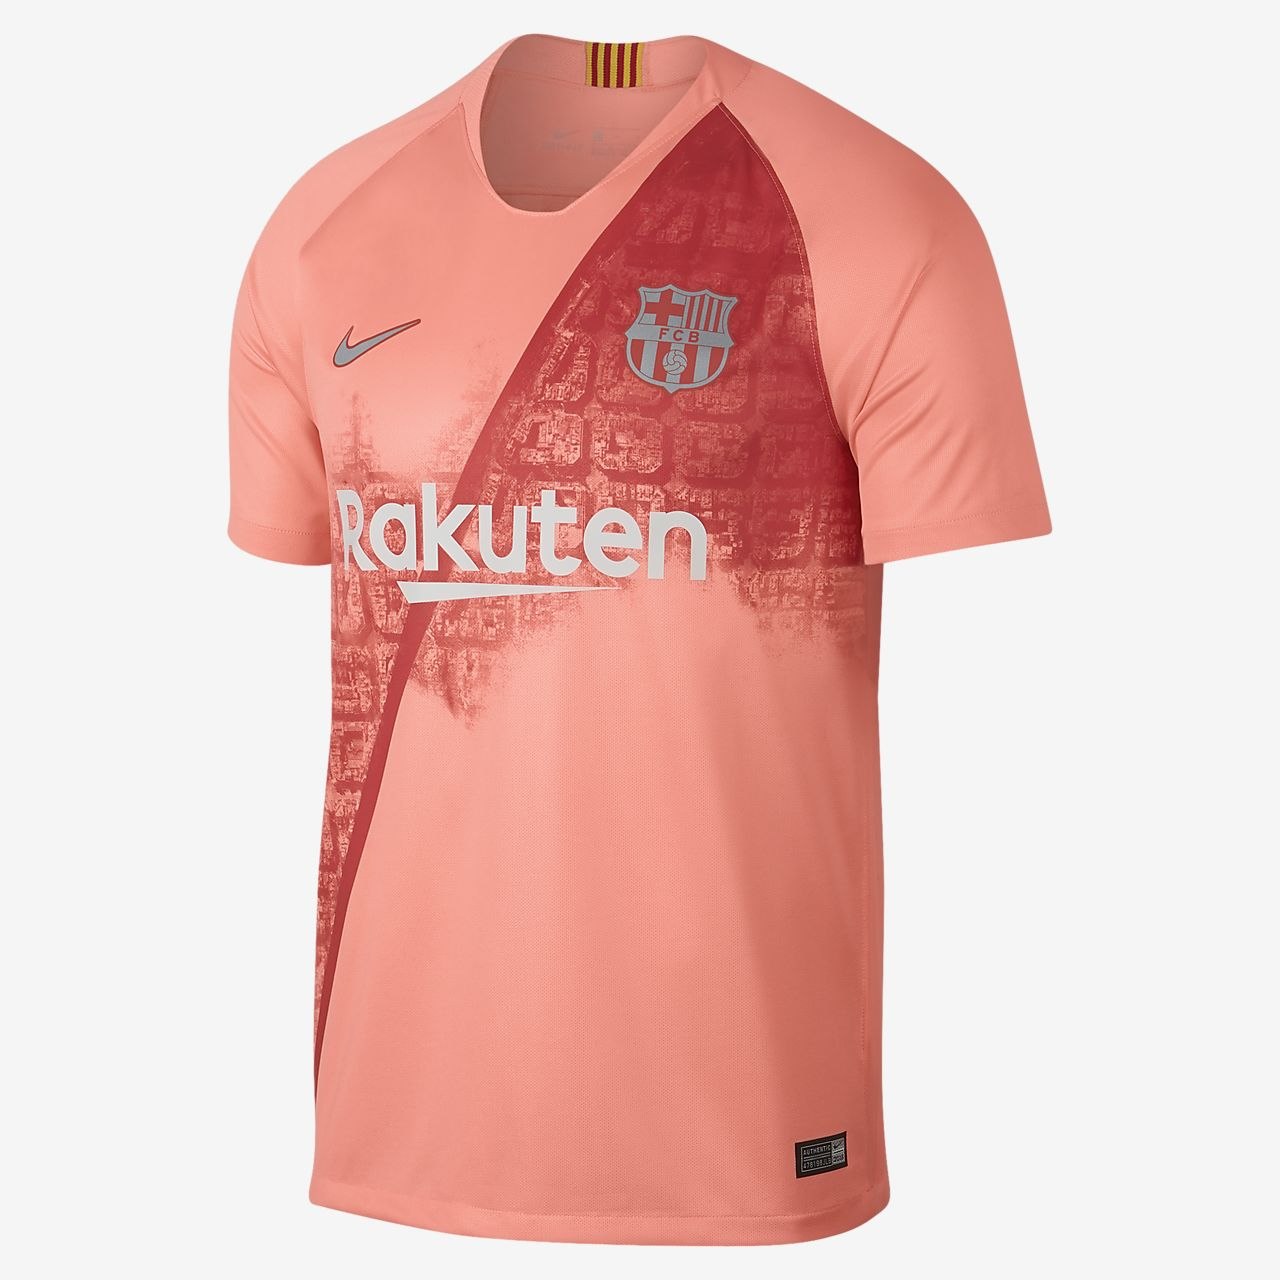 Camiseta de fútbol para hombre alternativa Stadium del FC Barcelona 2018/19